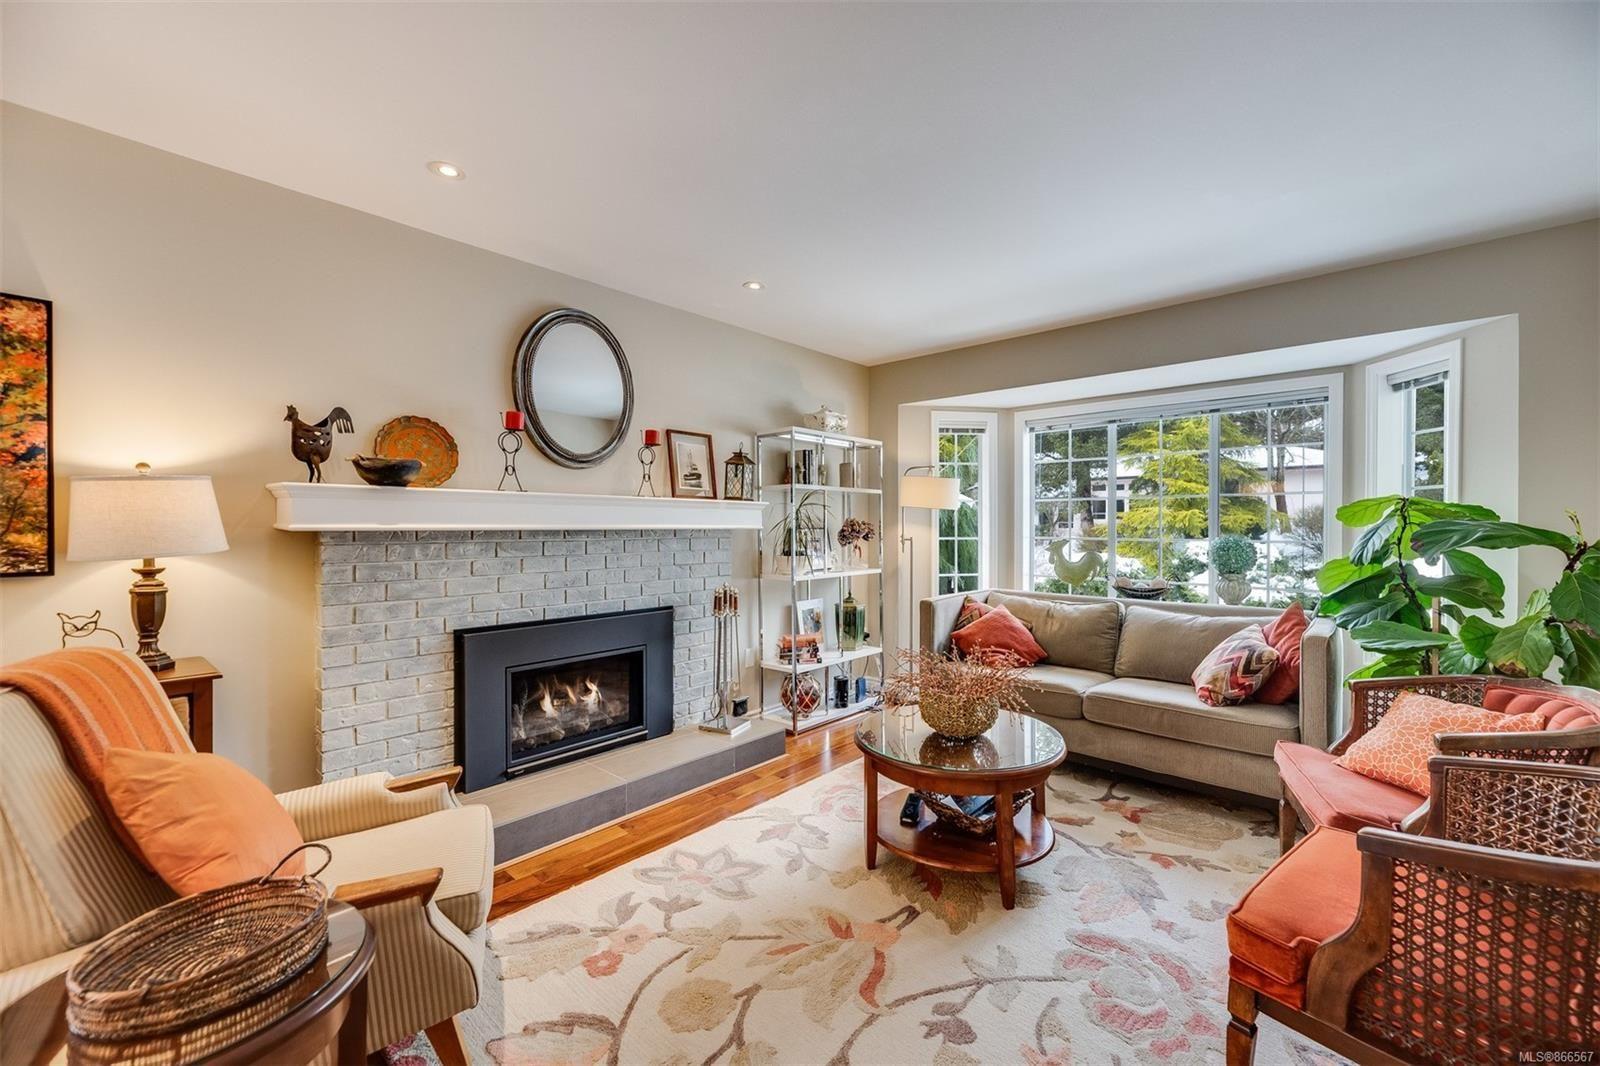 Main Photo: 8593 Deception Pl in : NS Dean Park House for sale (North Saanich)  : MLS®# 866567